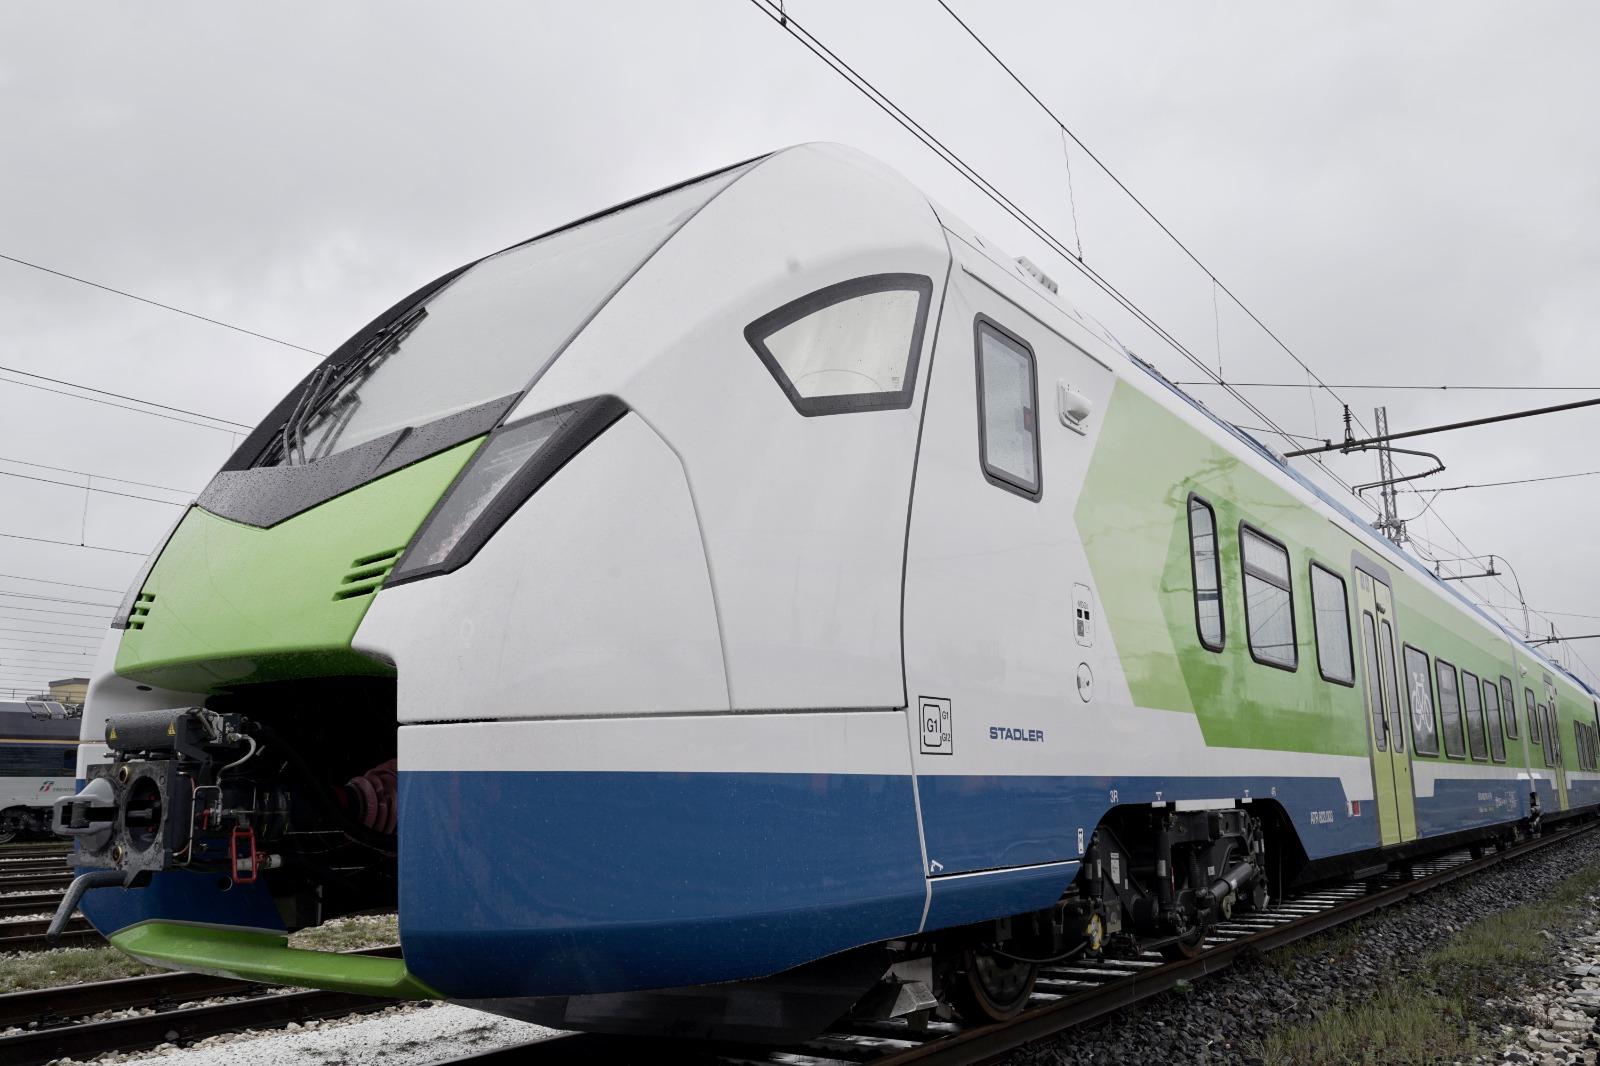 treno ibrido diesel elettrico